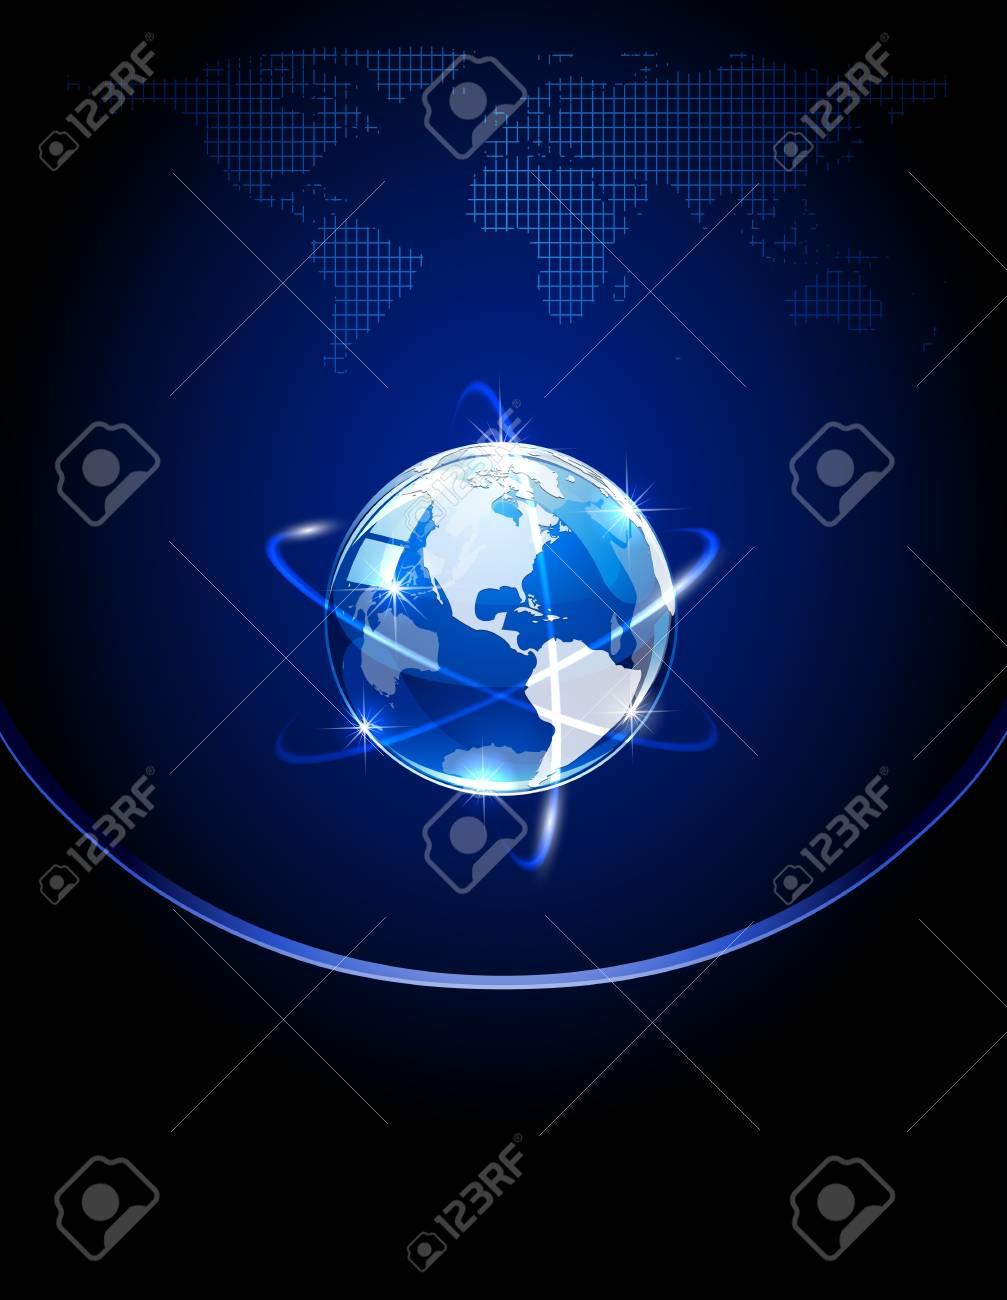 Blue shiny globe on dark background, illustration Stock Vector - 13902813